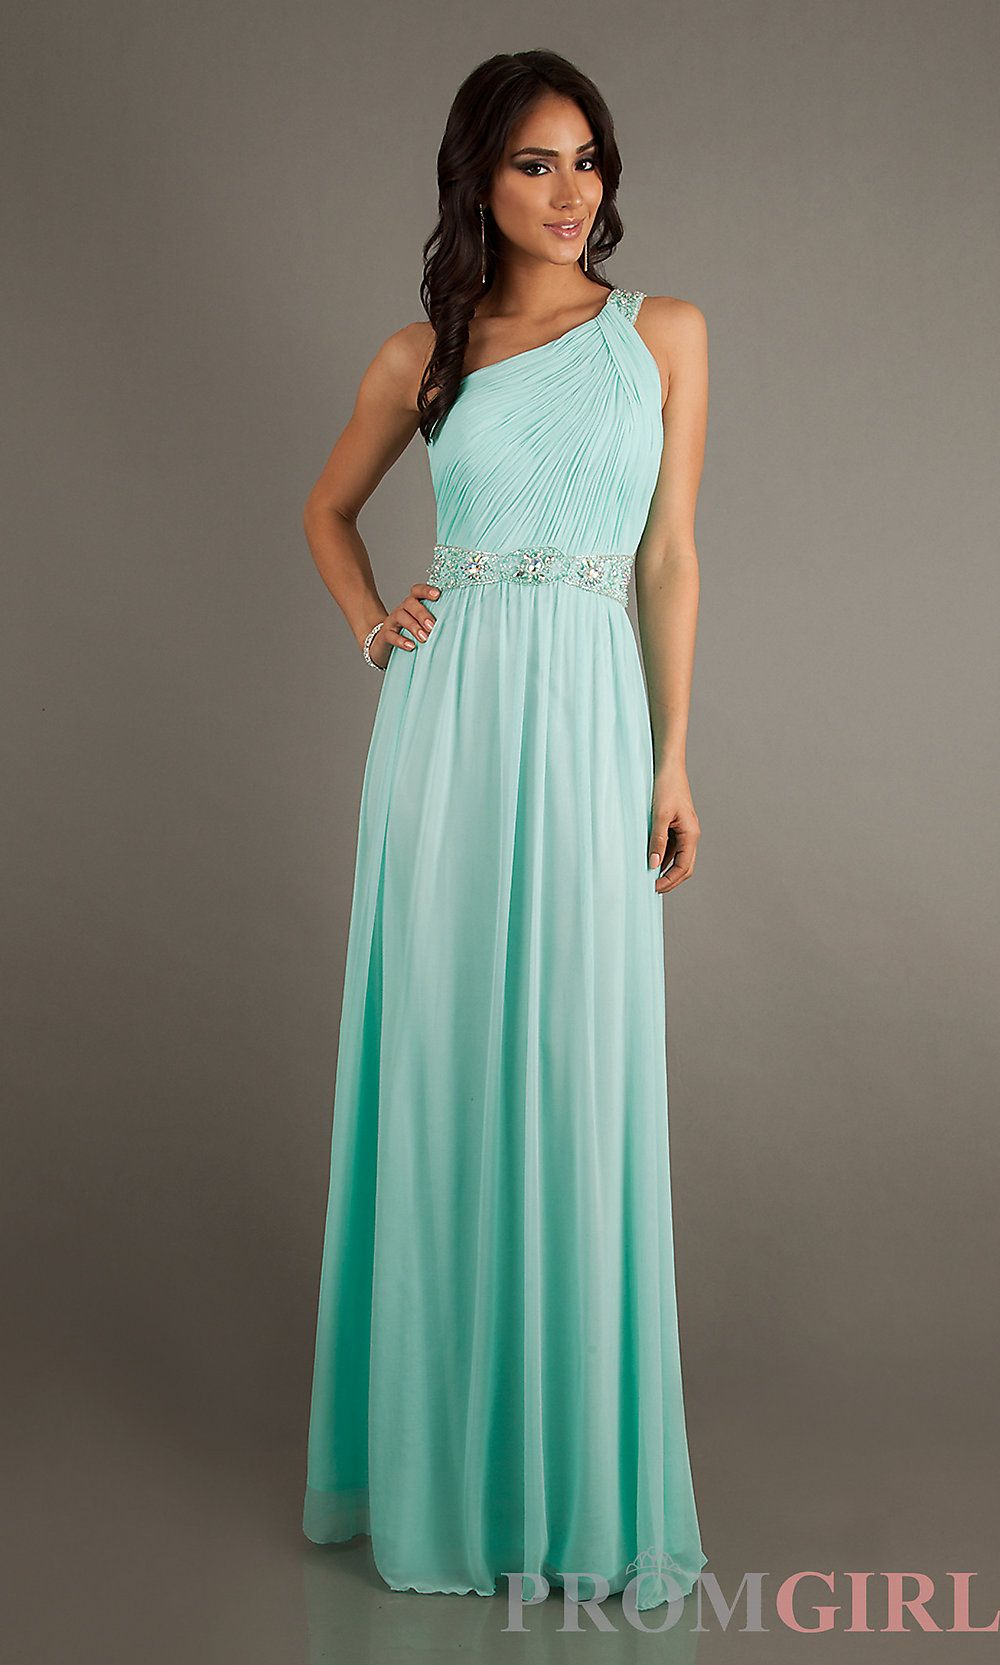 2013 temptation prom dress one shoulder evening gowns